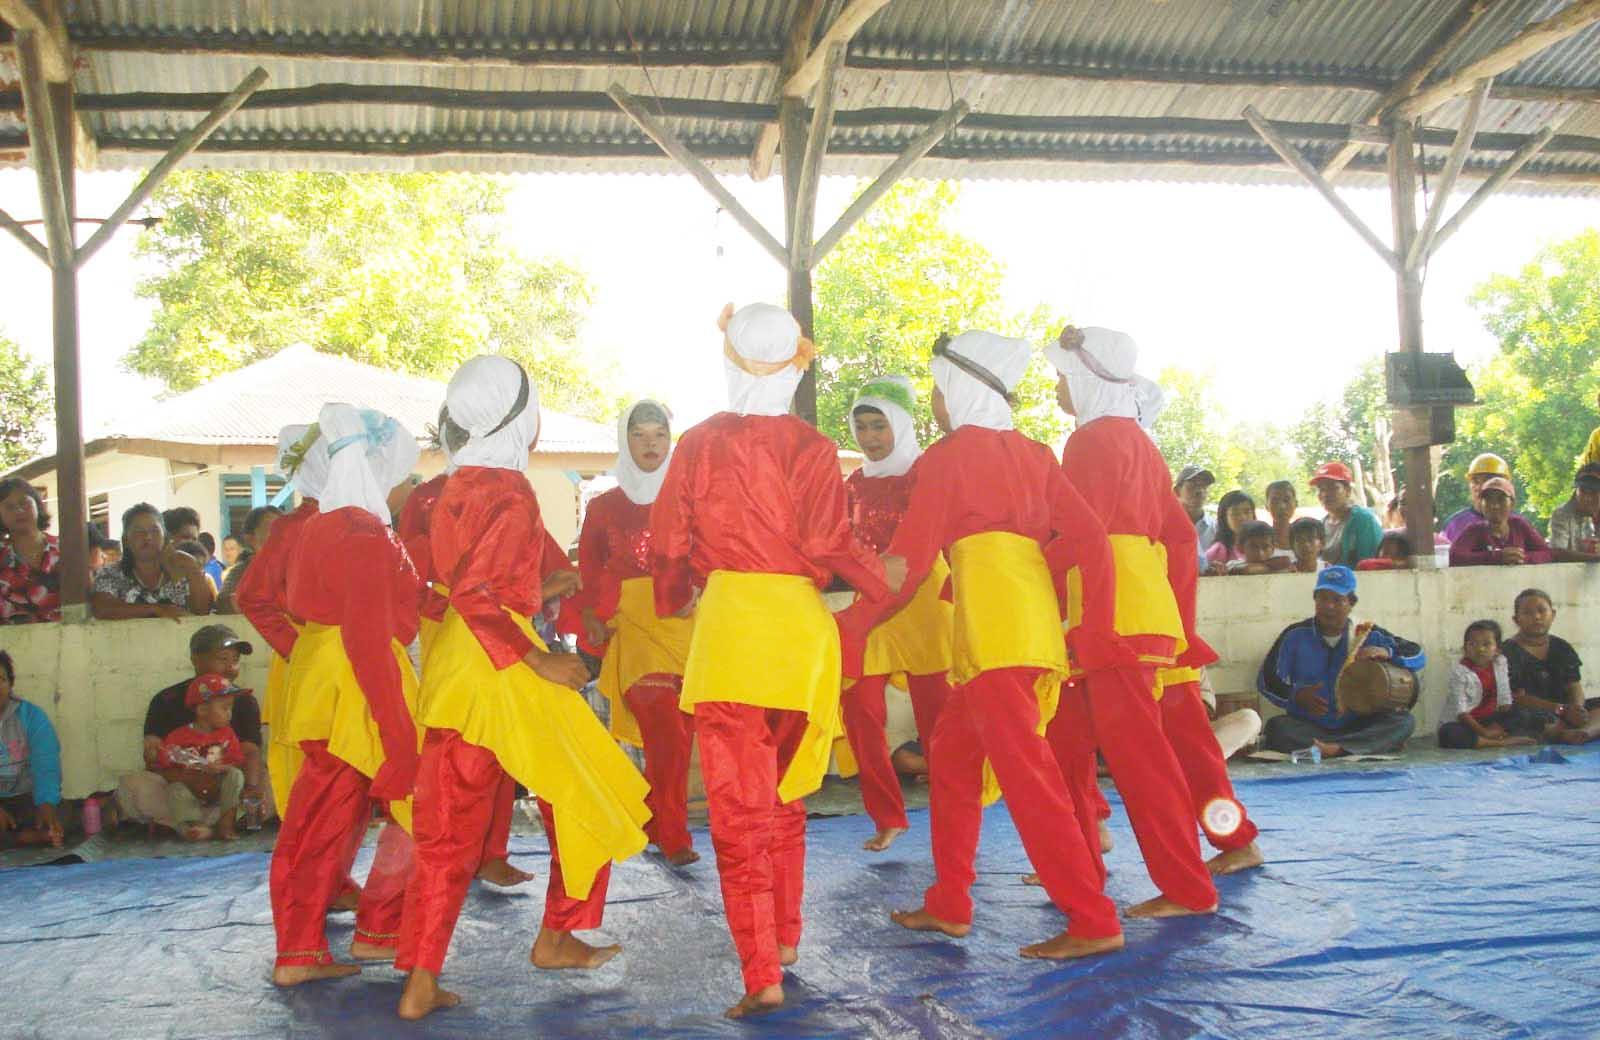 Tari Sepen, Tarian Tradisional Dari Kepulauan Bangka Belitung